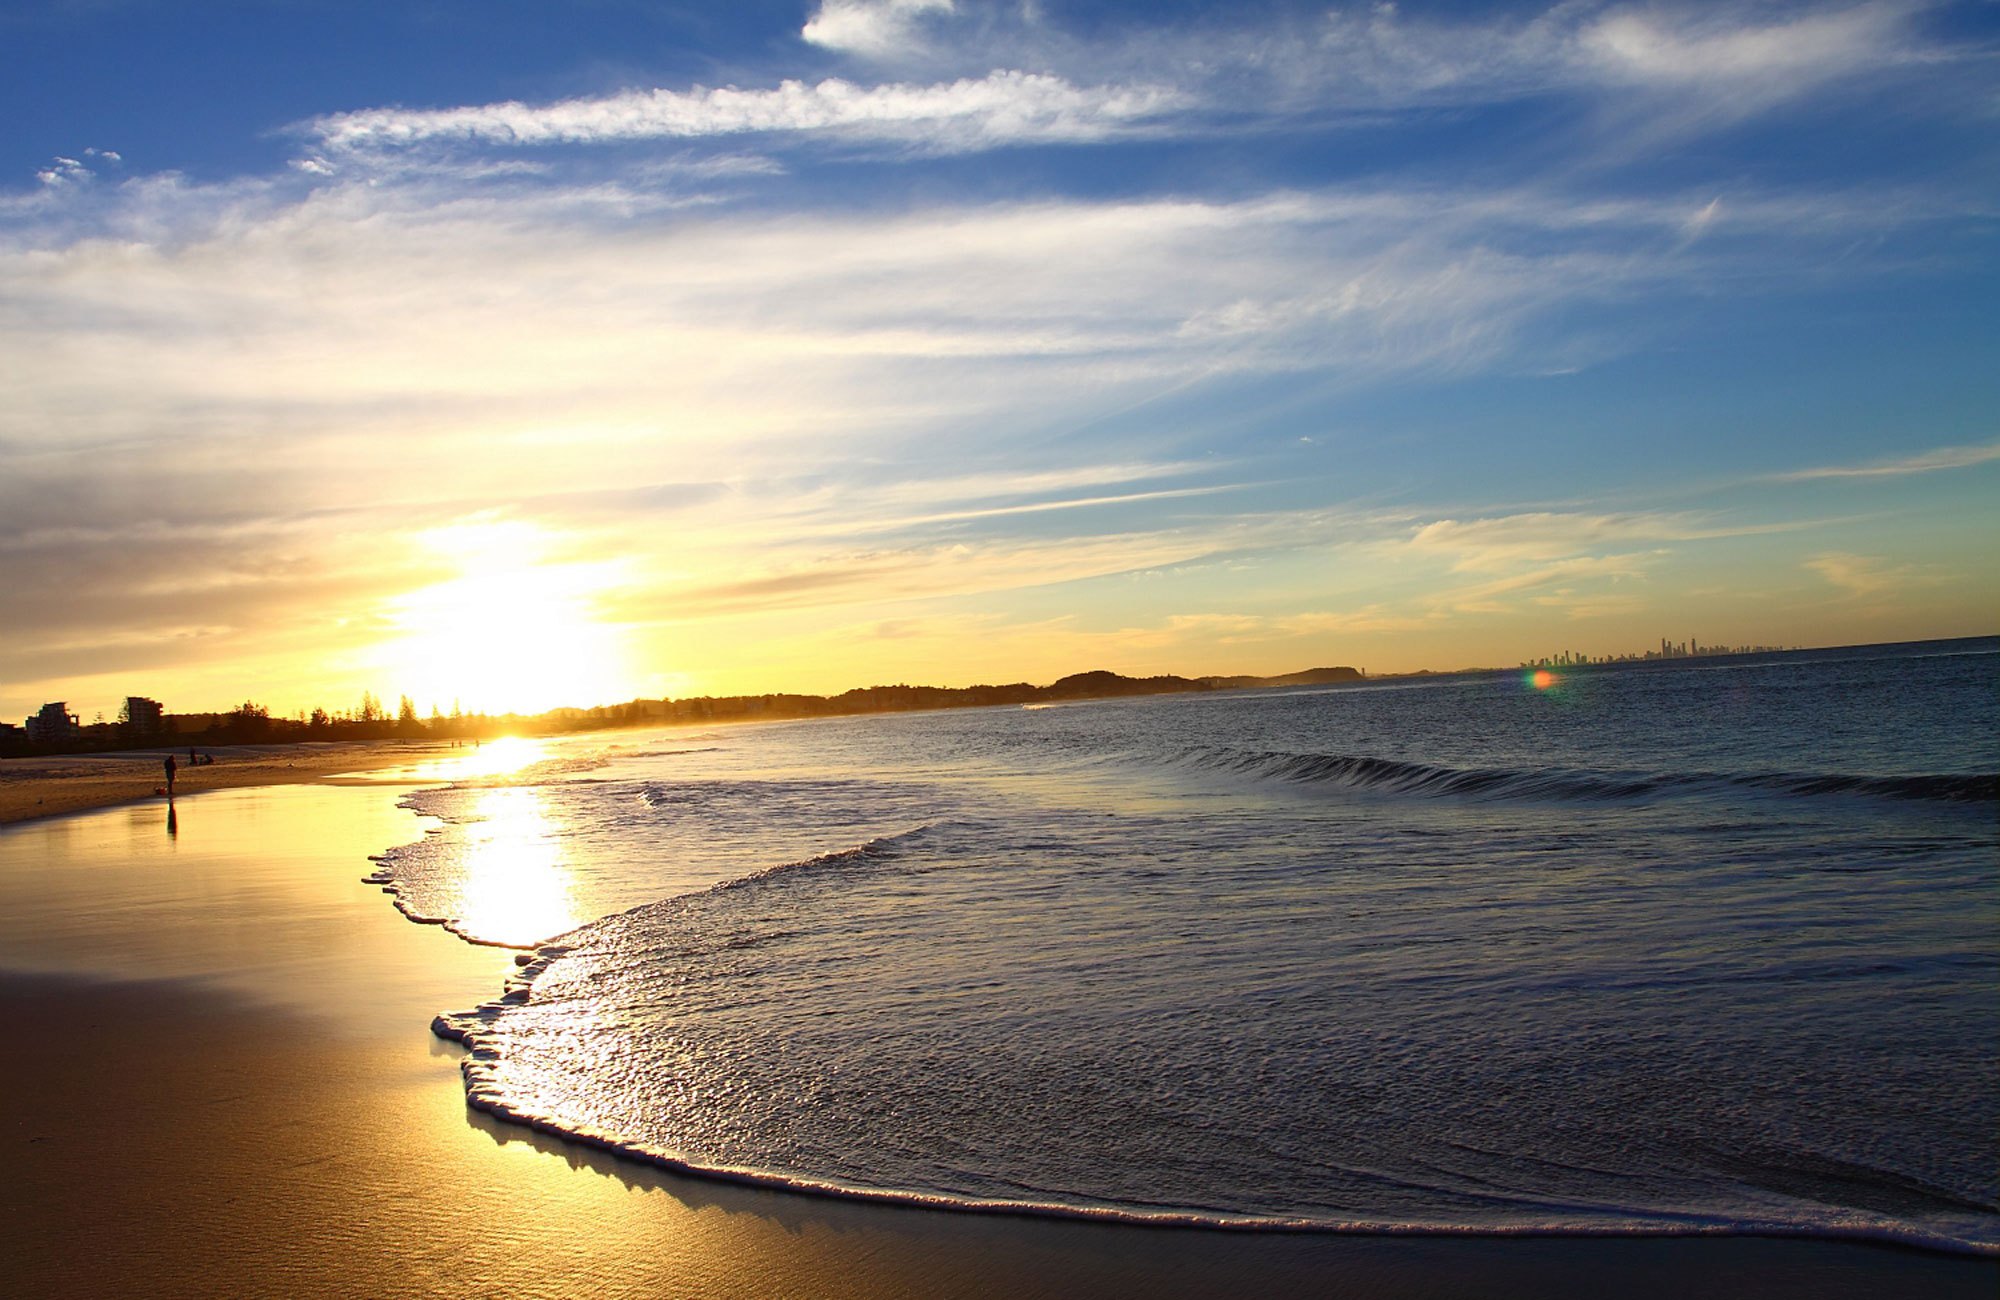 Voyage Australie - Gold-coast - Amplitudes